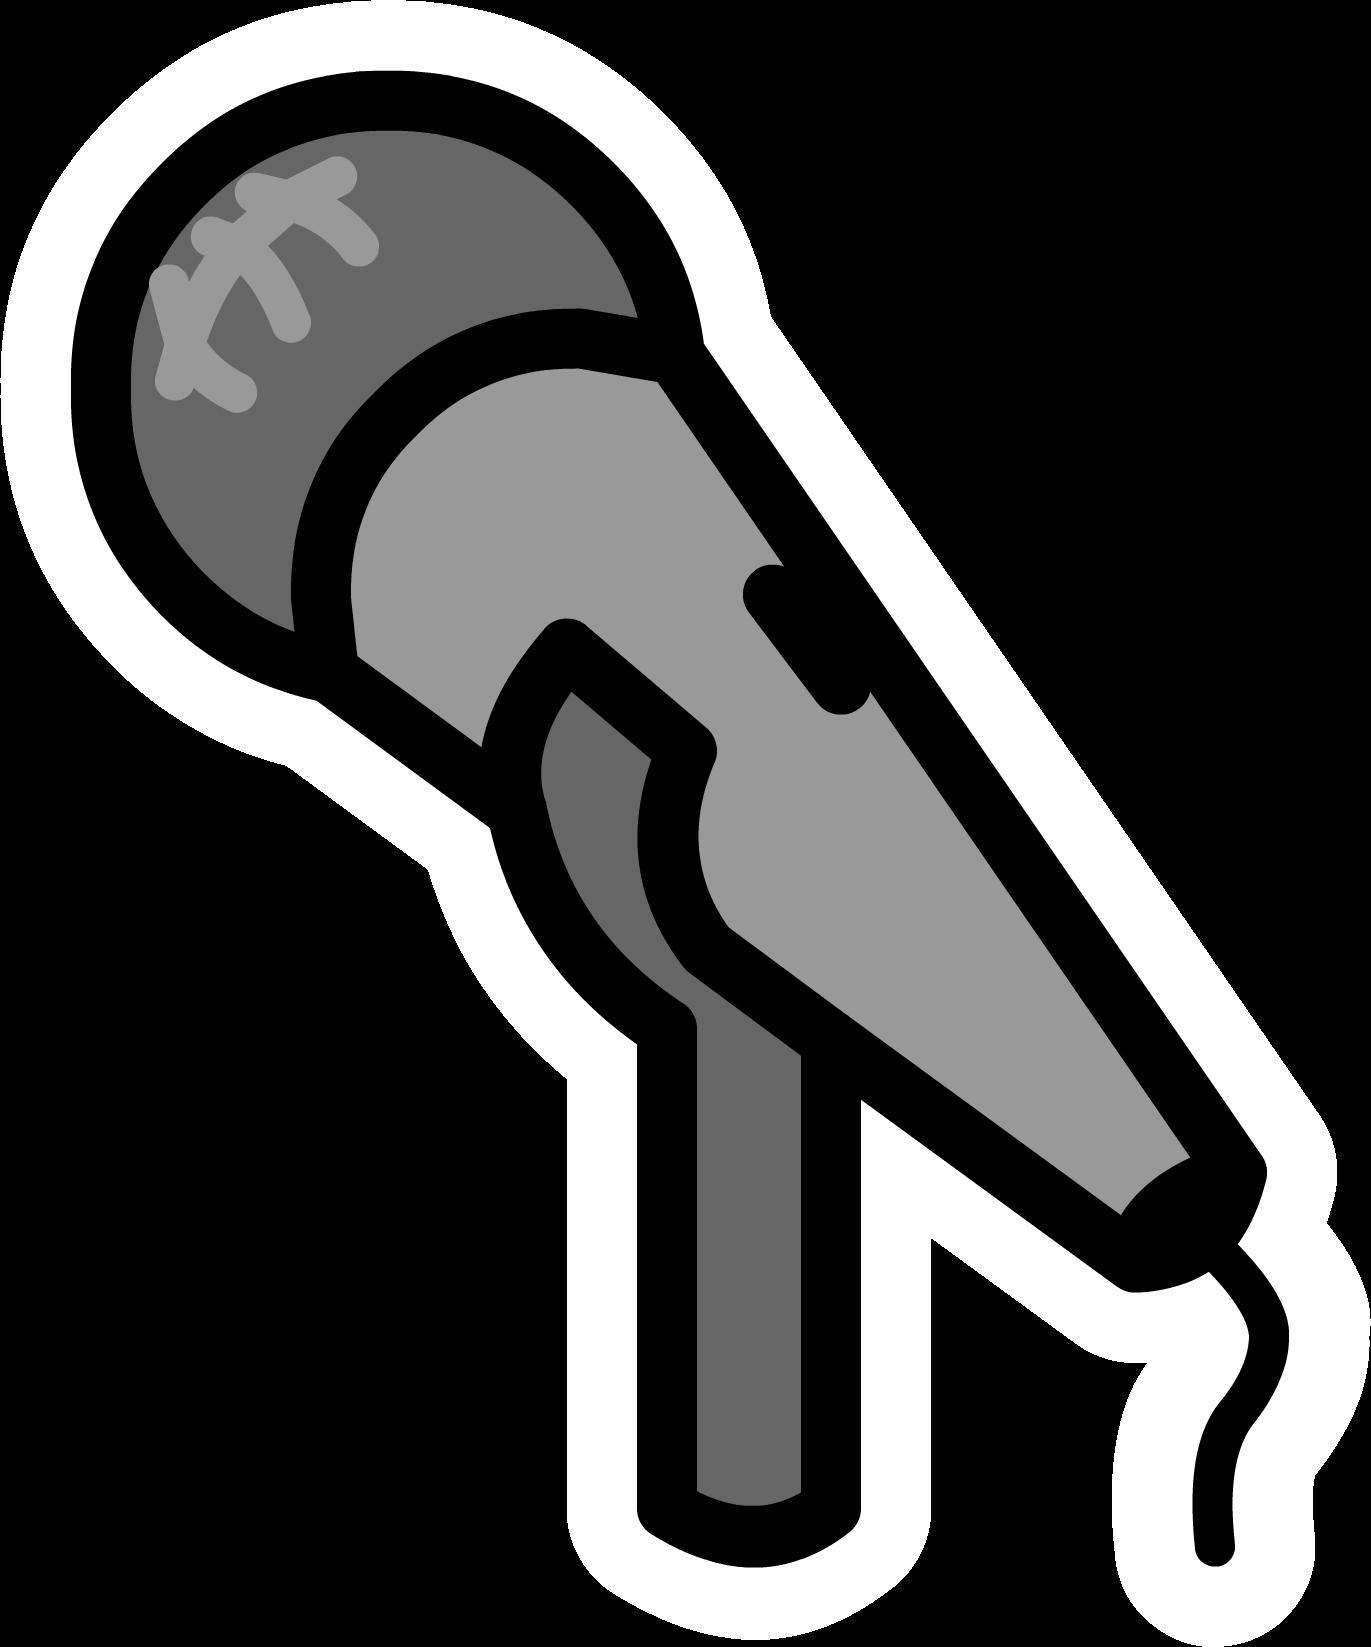 Microphone Pin Club Penguin Wiki Fandom Powered By Wikia